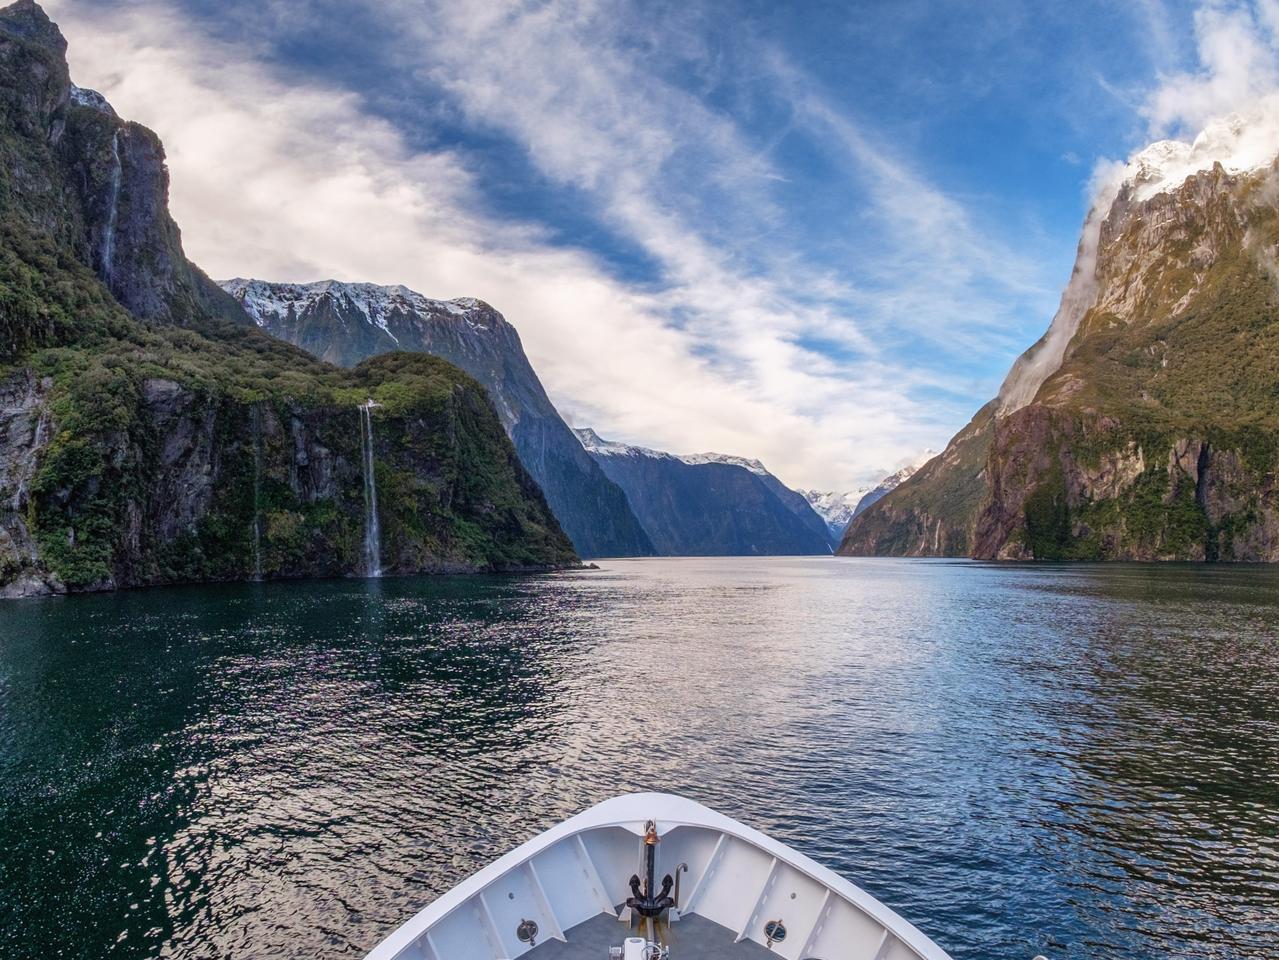 Travel tourist destination landscape of Milford sound in New Zealand